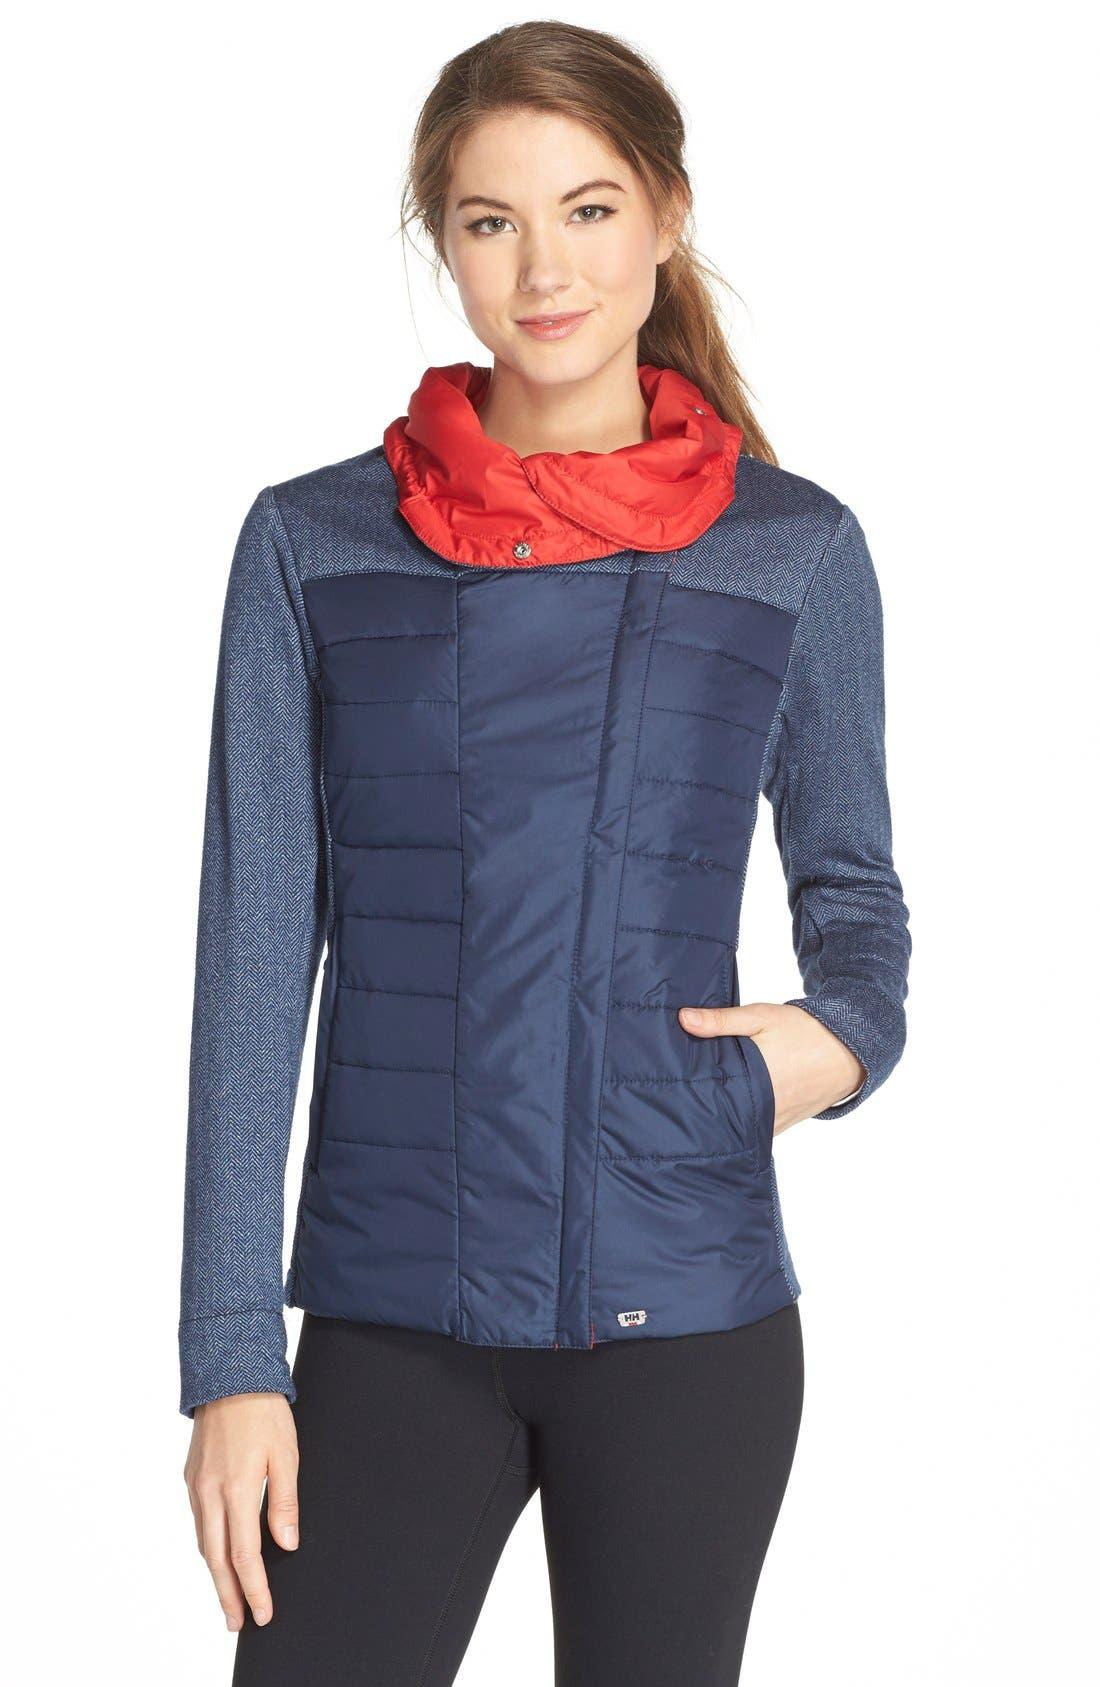 Main Image - HellyHansen 'Astra' Jacket